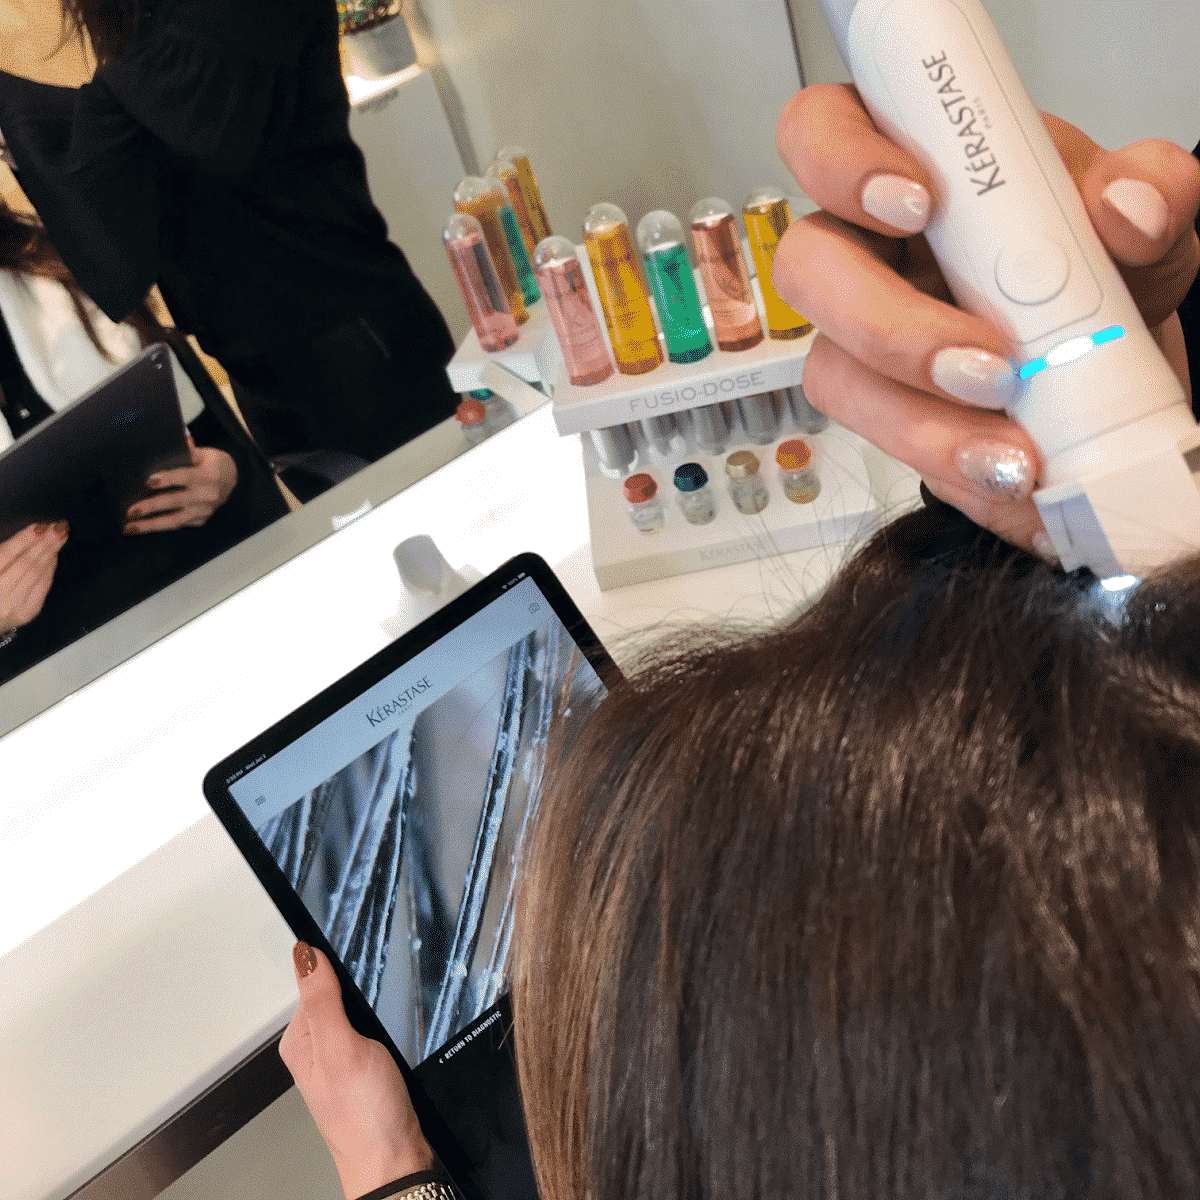 Kerastase hair diagnosis tool and app